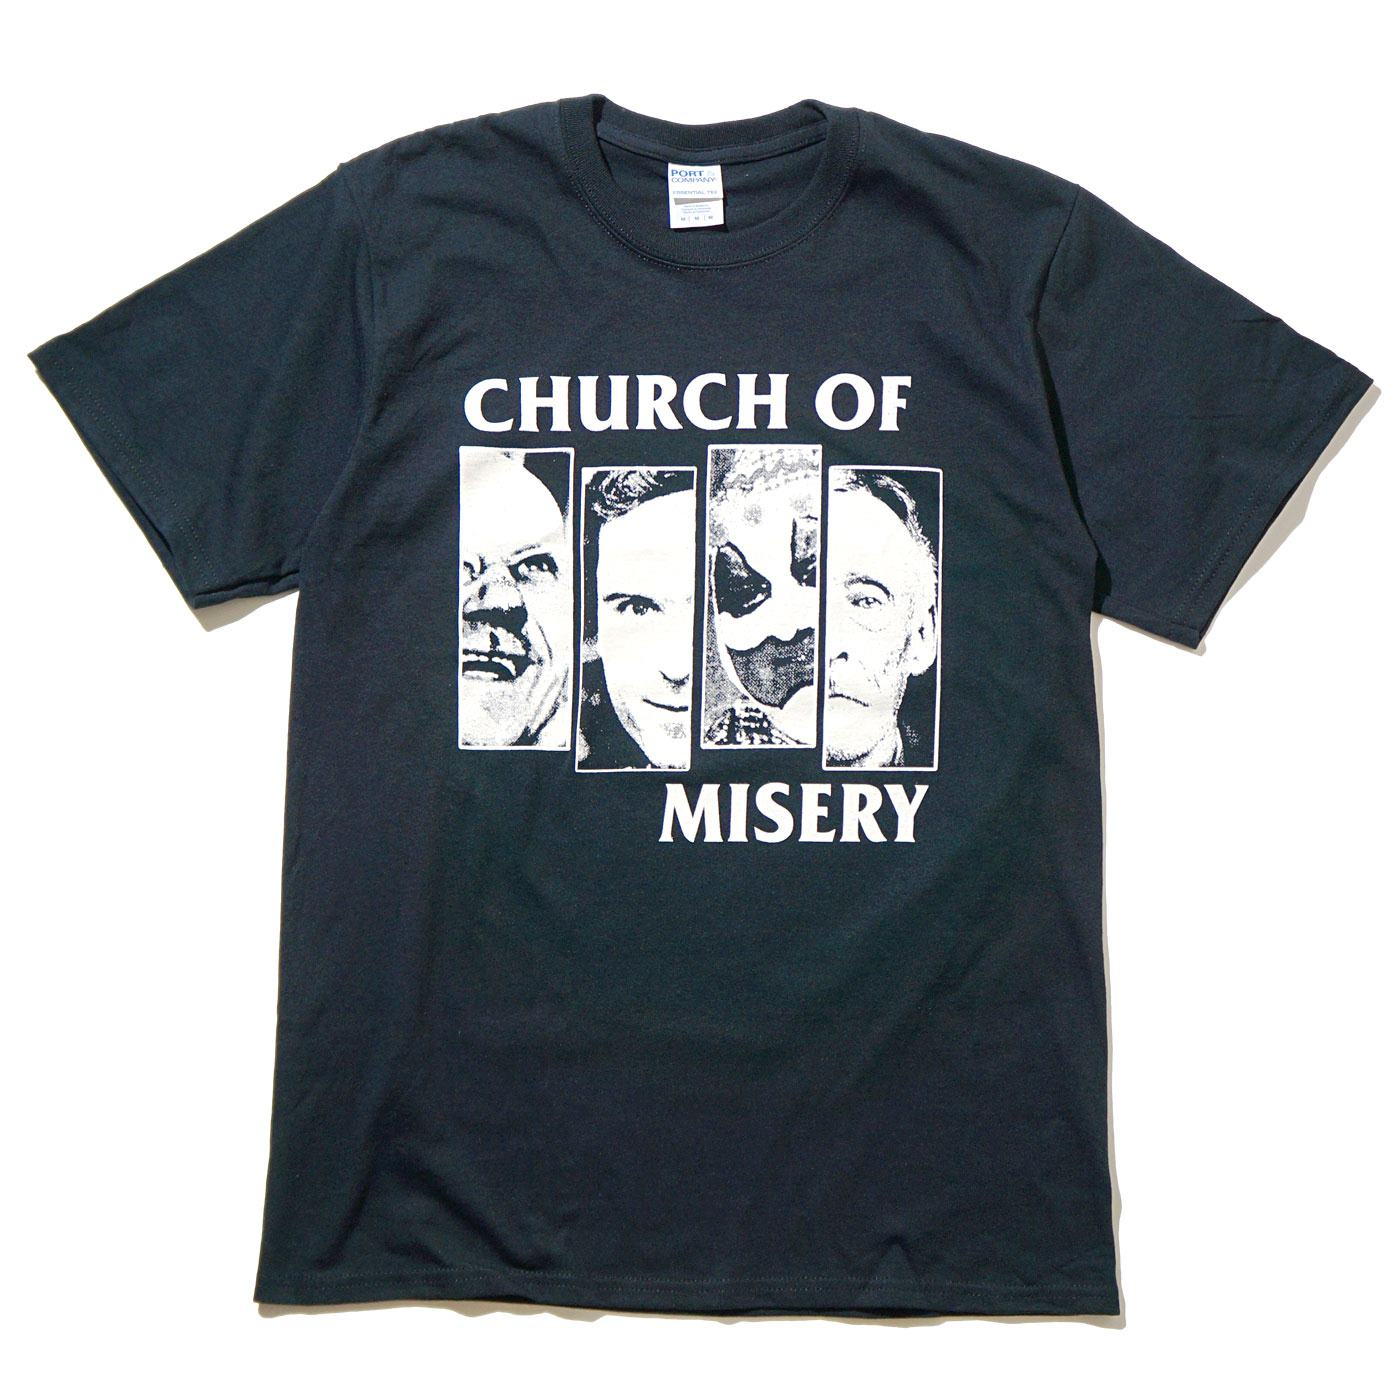 CHURCH OF MISERY Tシャツ Black Flag